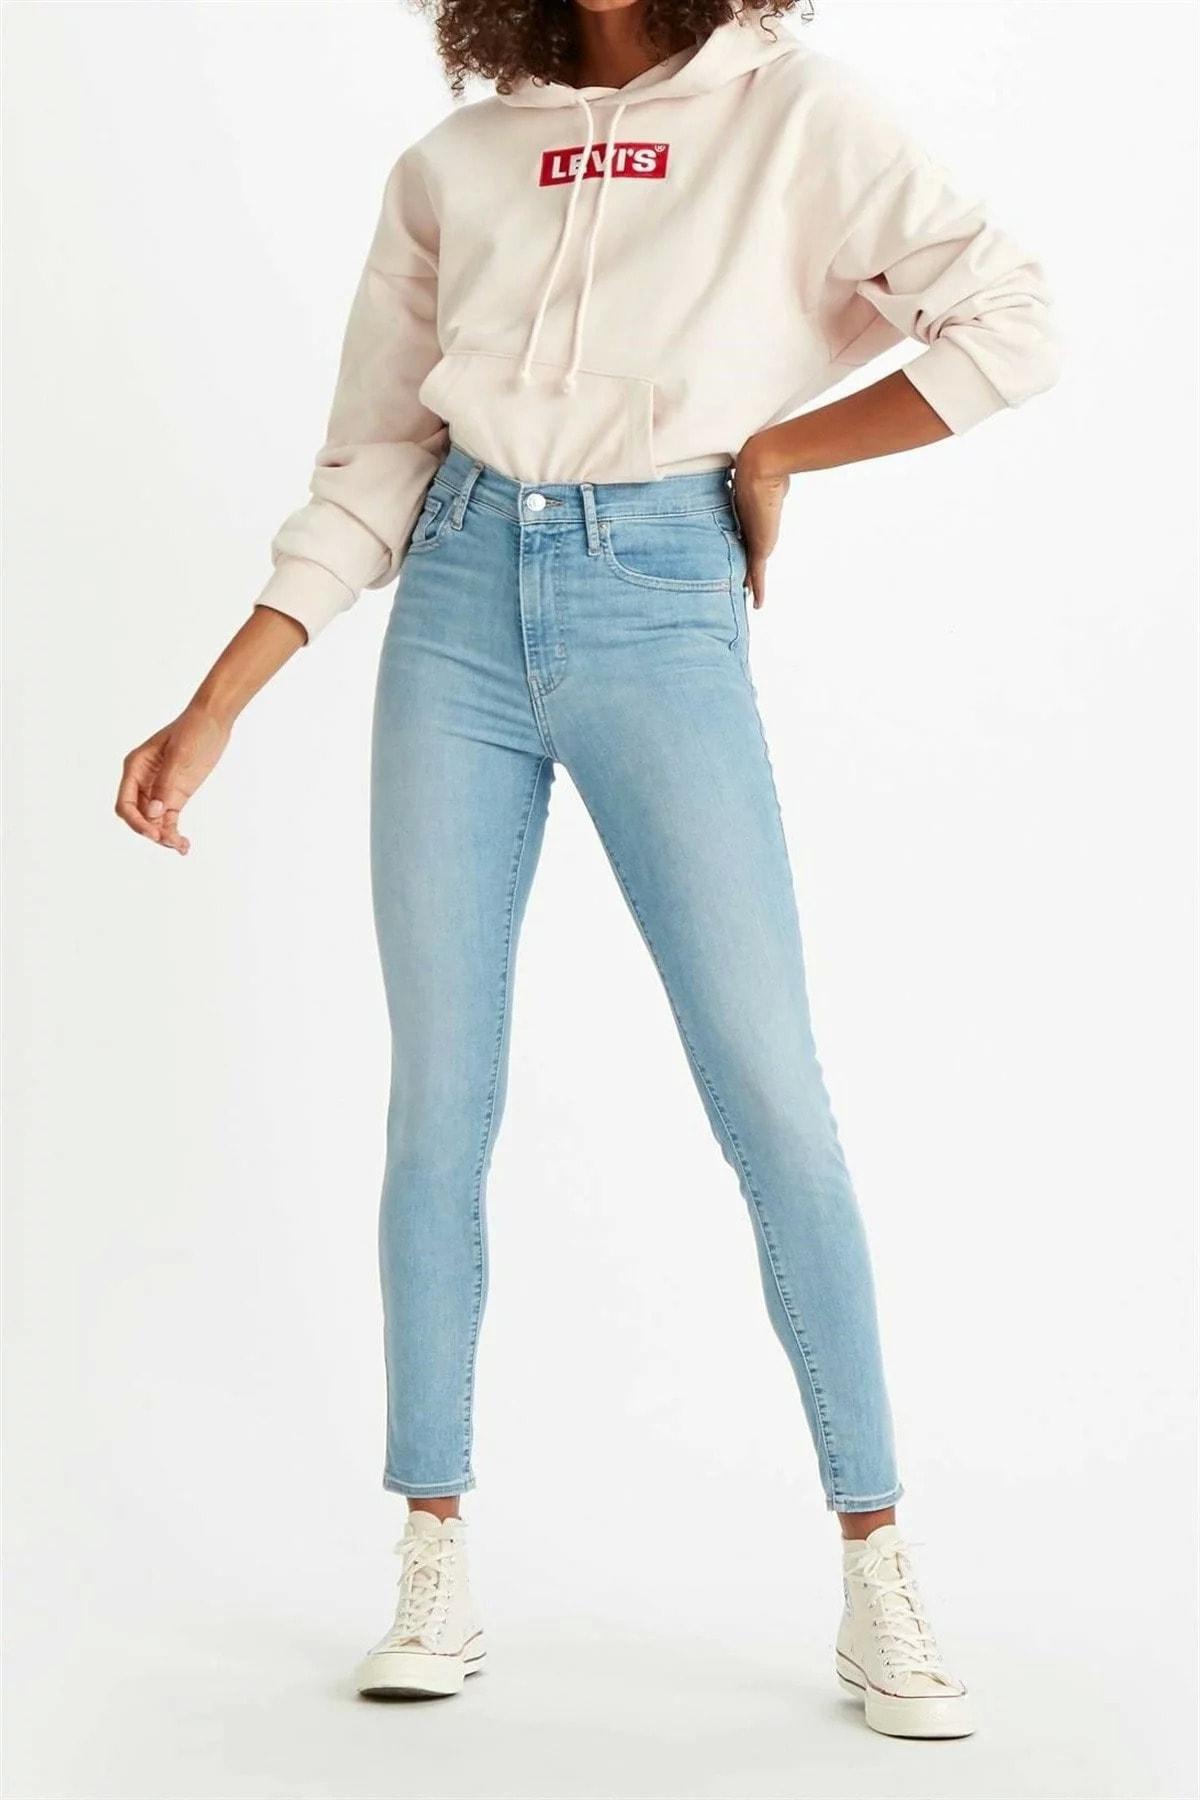 Levi's Kadın Mile High Super Skinny Jean 22791-0110 1